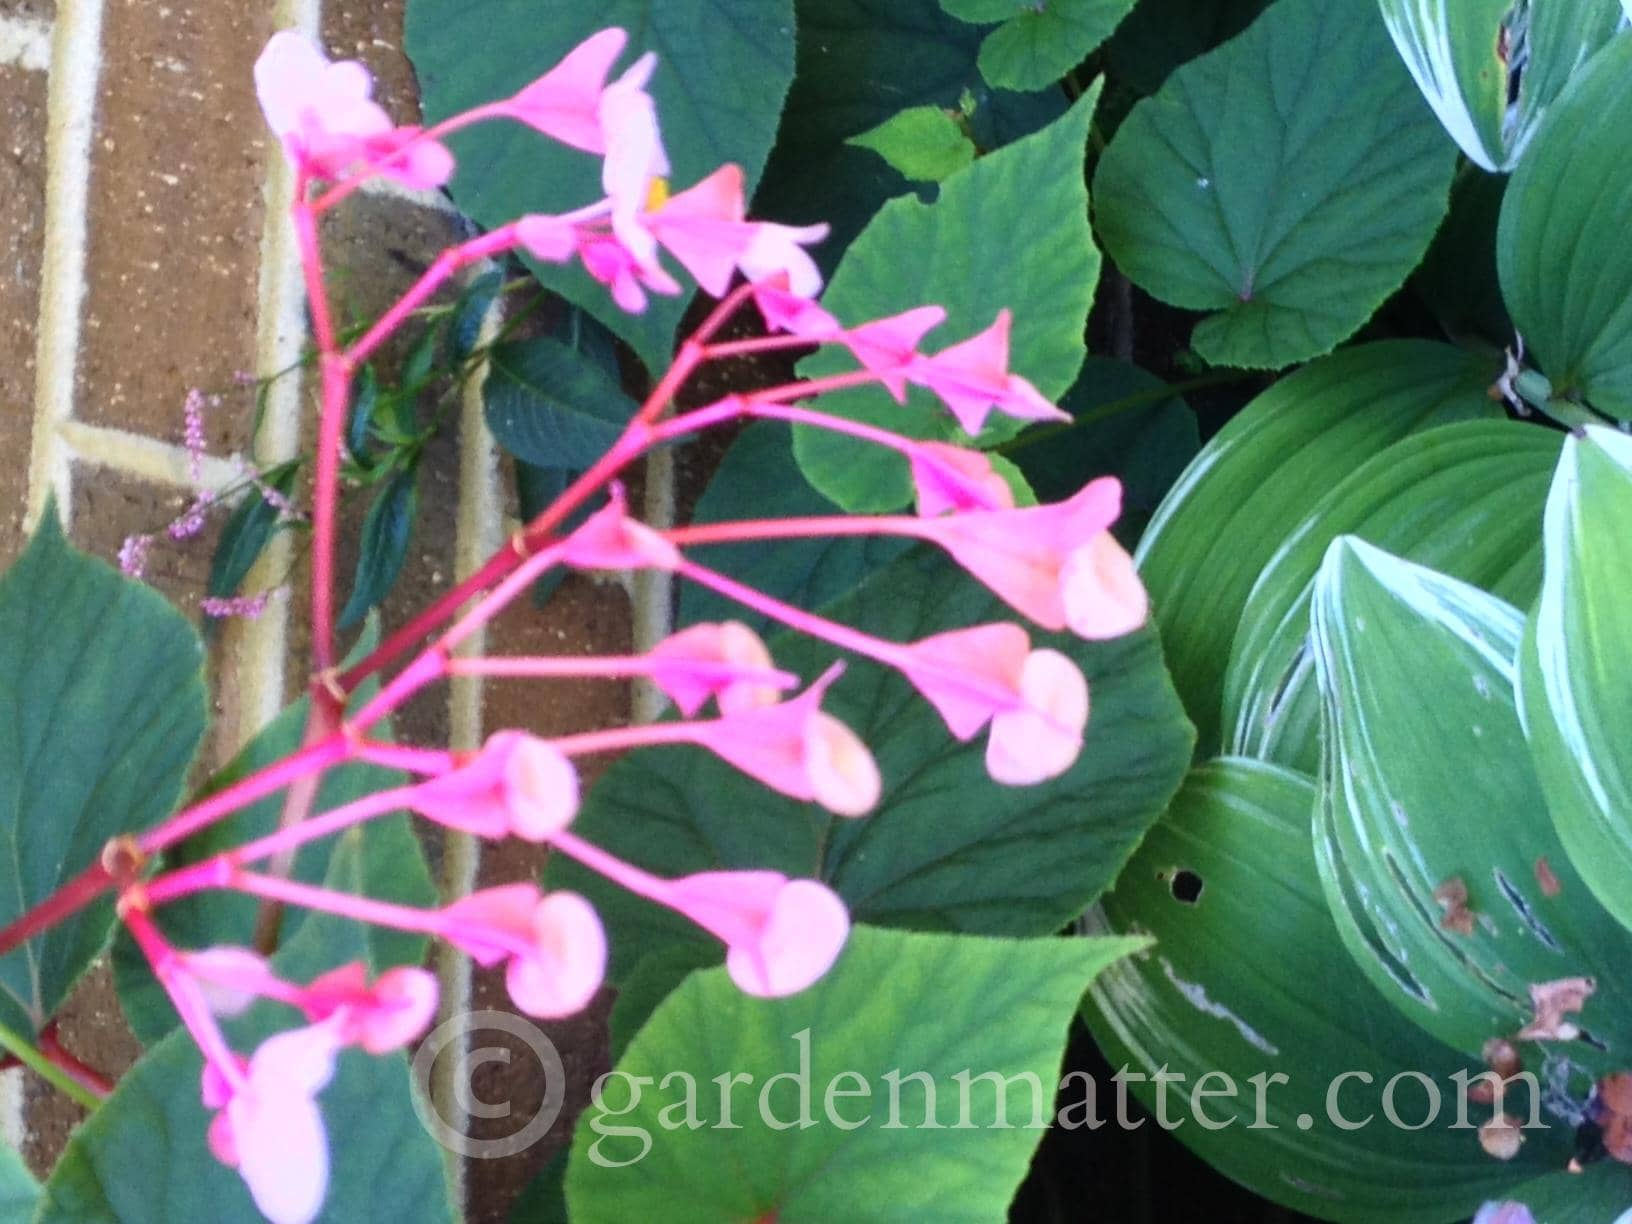 Begonia grandis seed heads